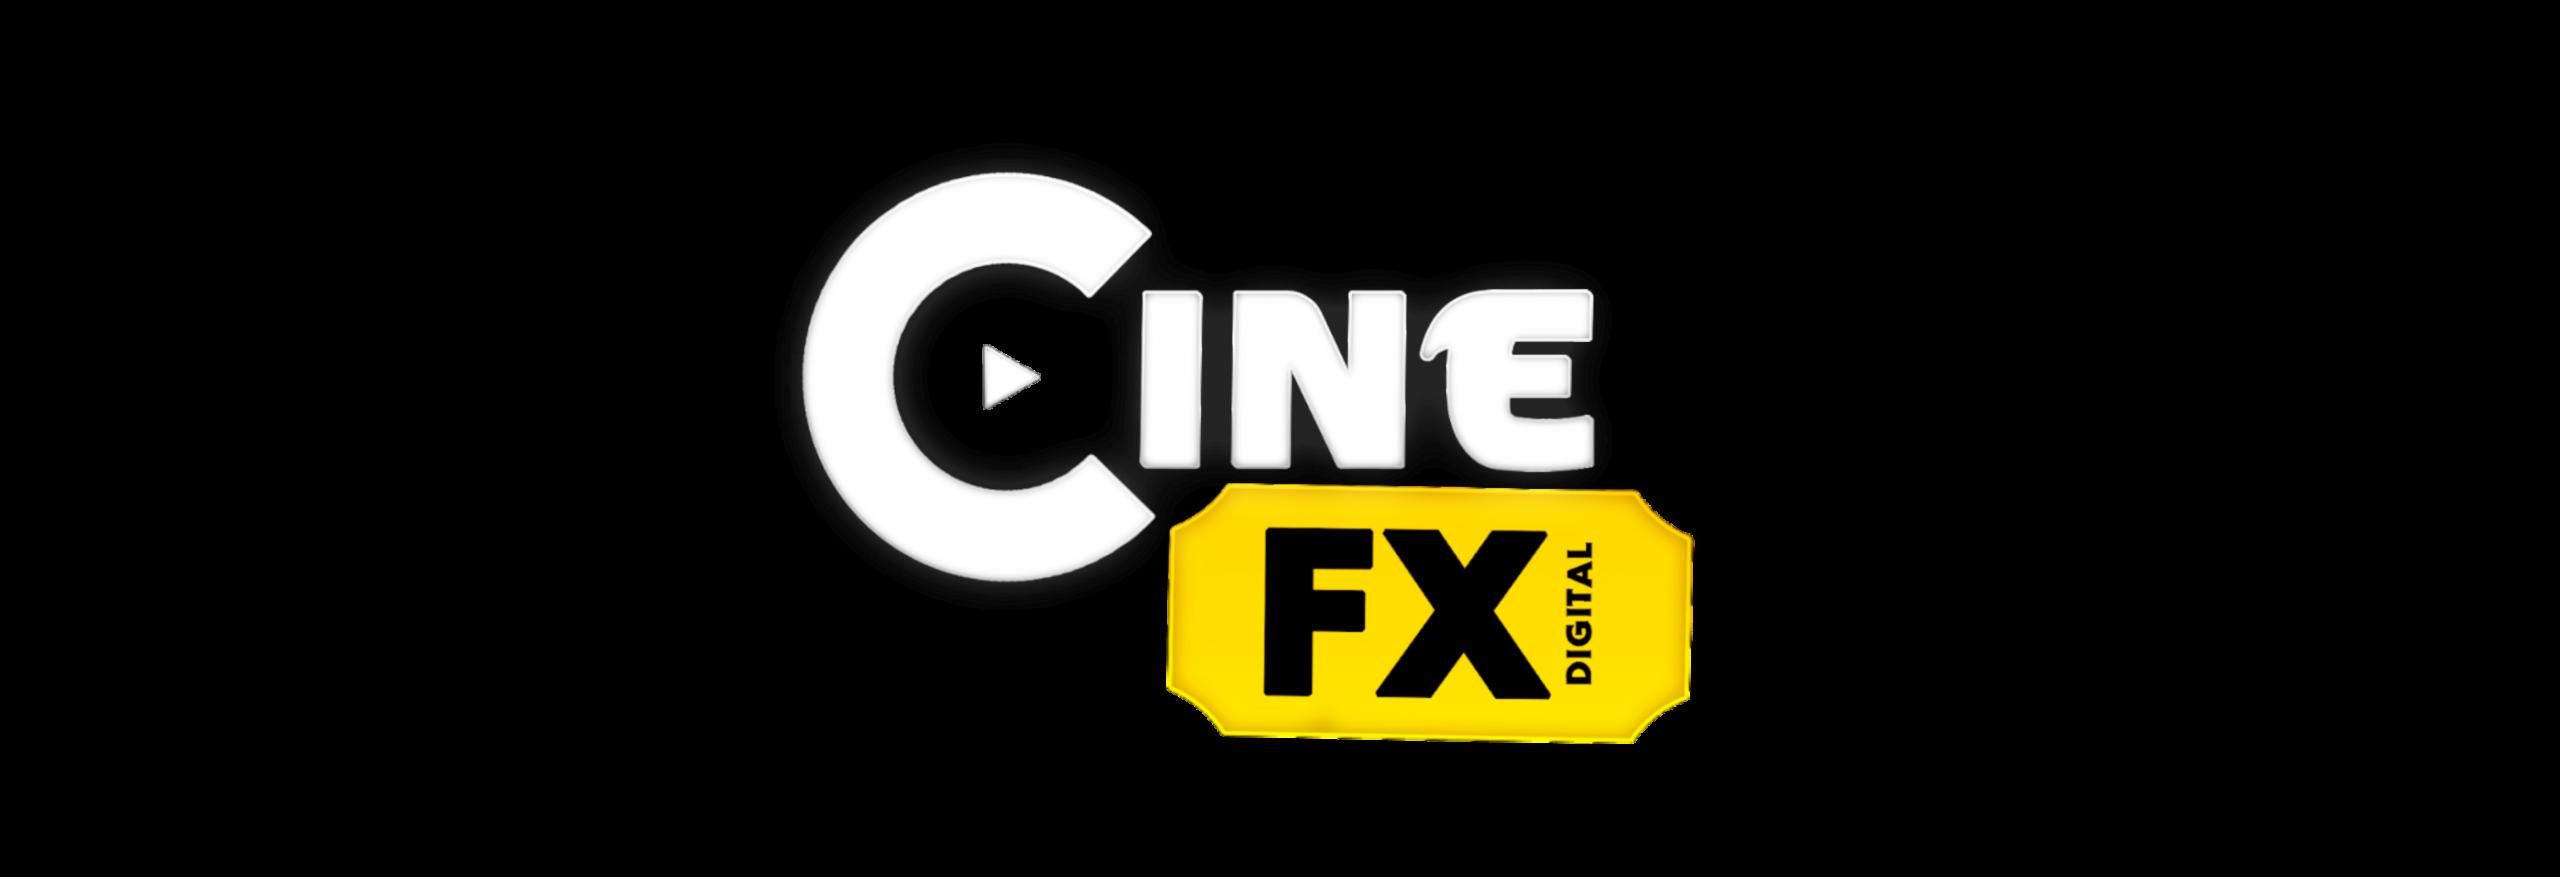 CINE FX